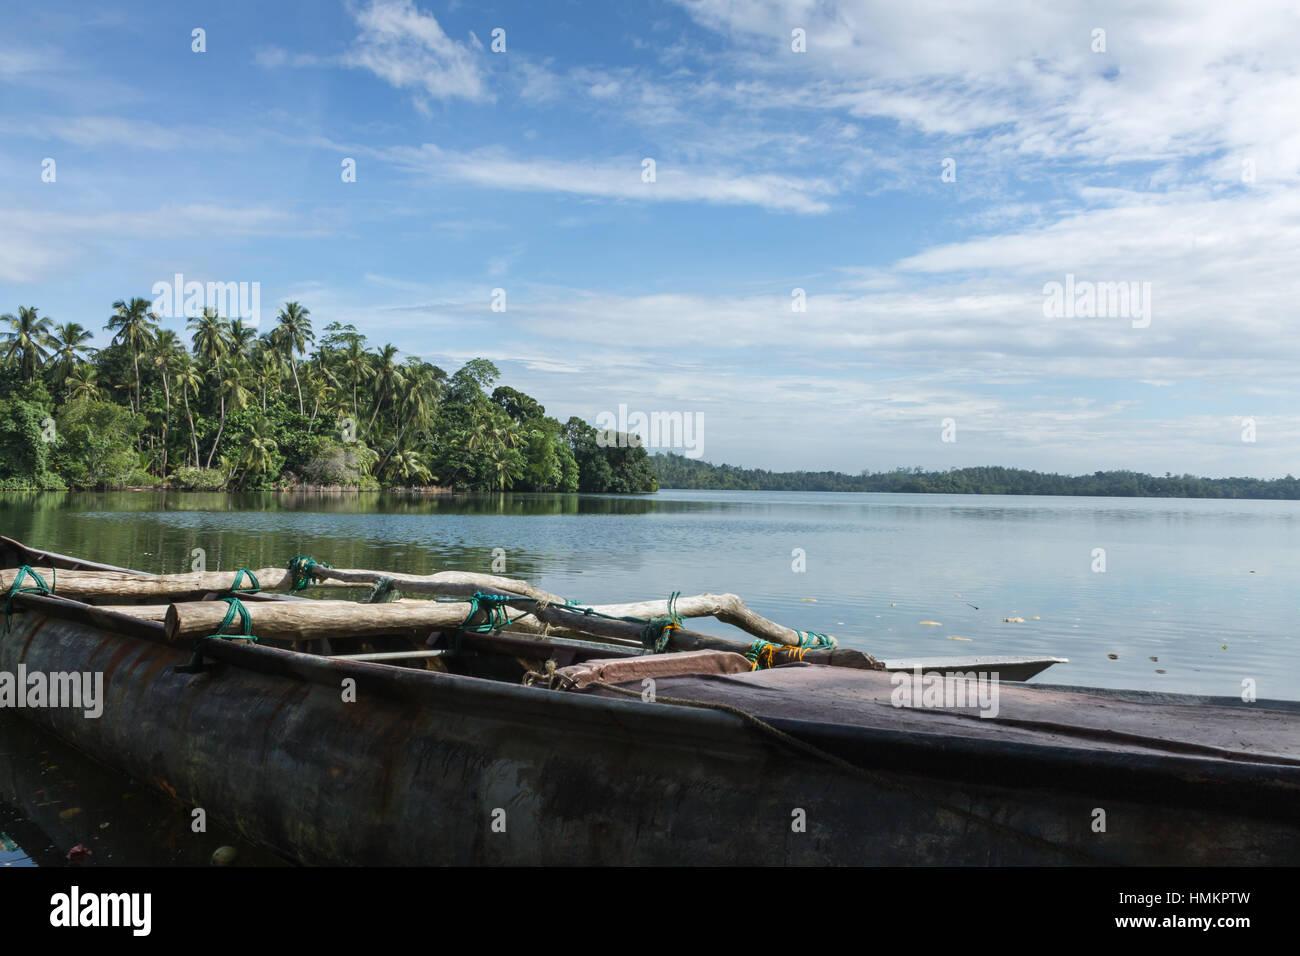 fishing boats on the lake in the jungles of Sri Lanka. Stock Photo